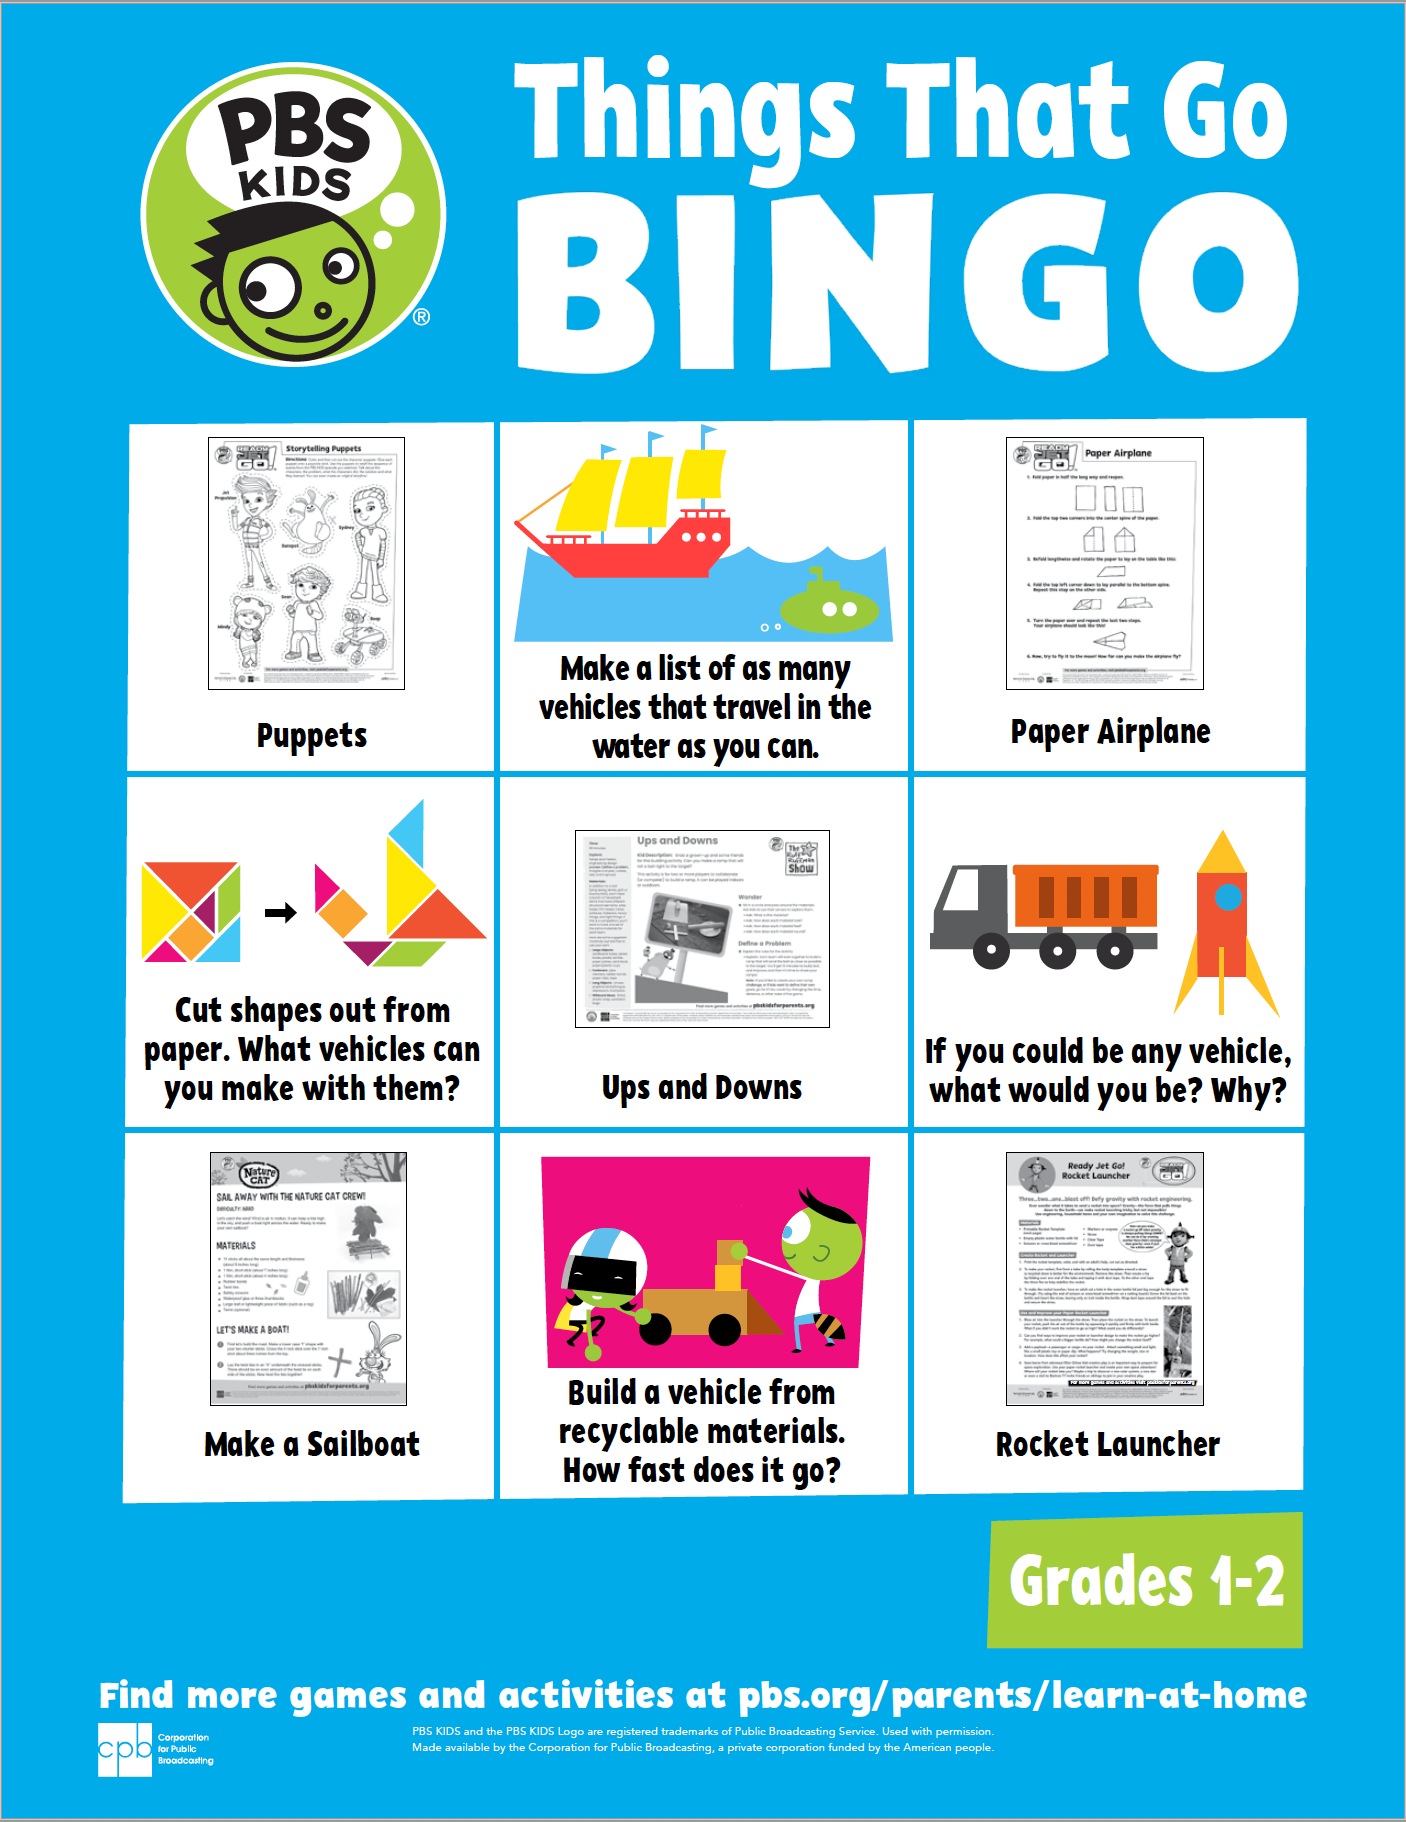 Things that go bingo card